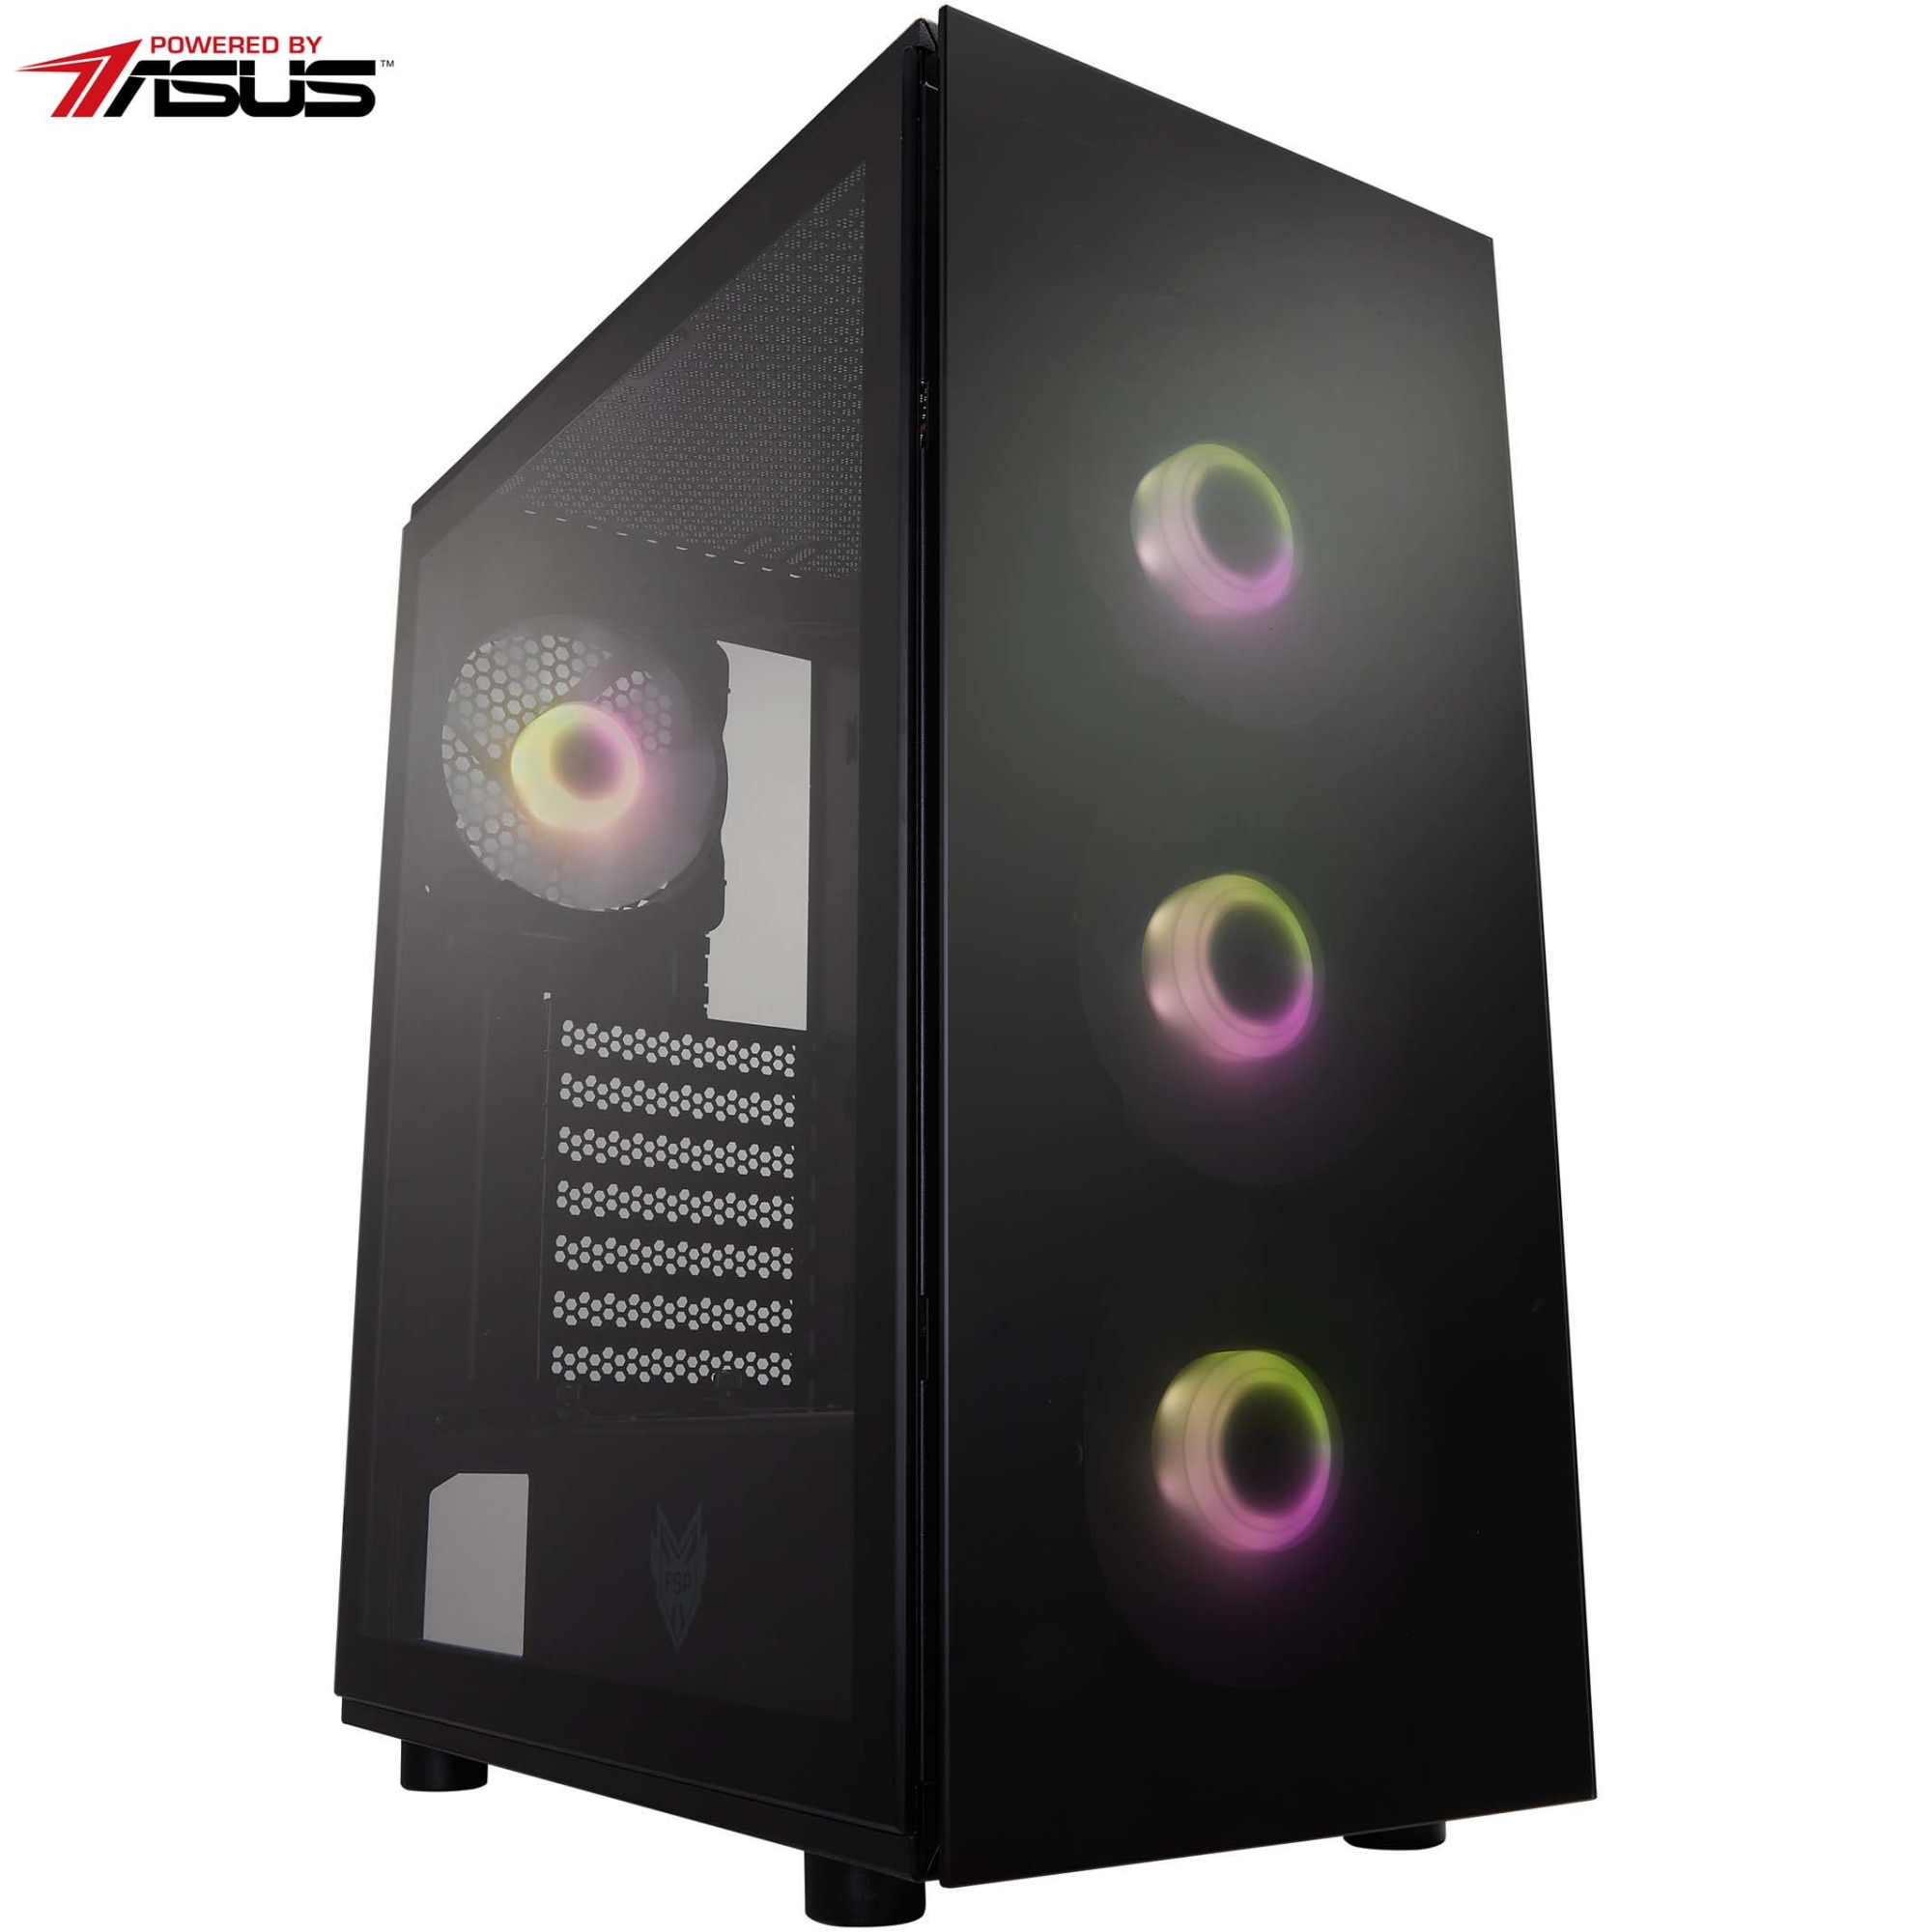 Fotografie Sistem Desktop PC Gaming Serioux Powered by ASUS cu procesor AMD Ryzen™ 5 3500X pana la 4.10GHz, 16GB DDR4, 500GB SSD, Radeon™ RX 5500 XT 4GB GDDR6